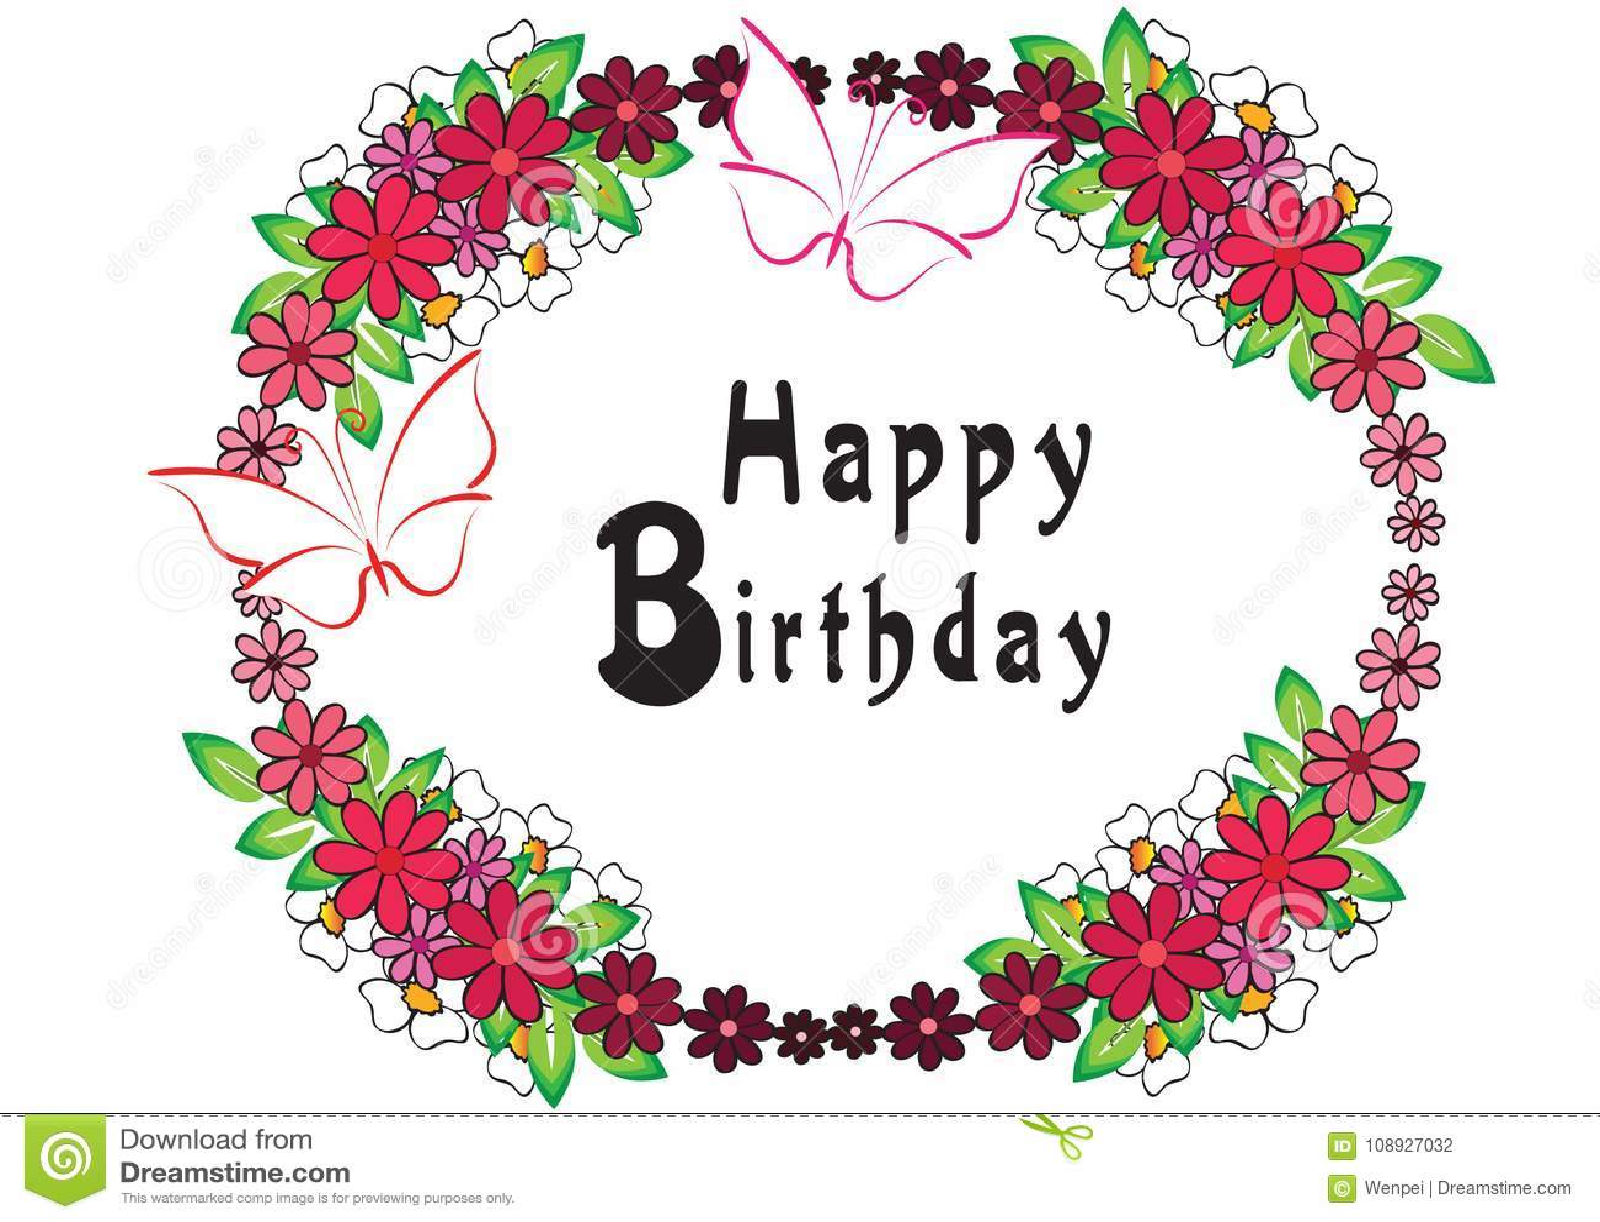 Happy Birthday Card Design Vector Drawing